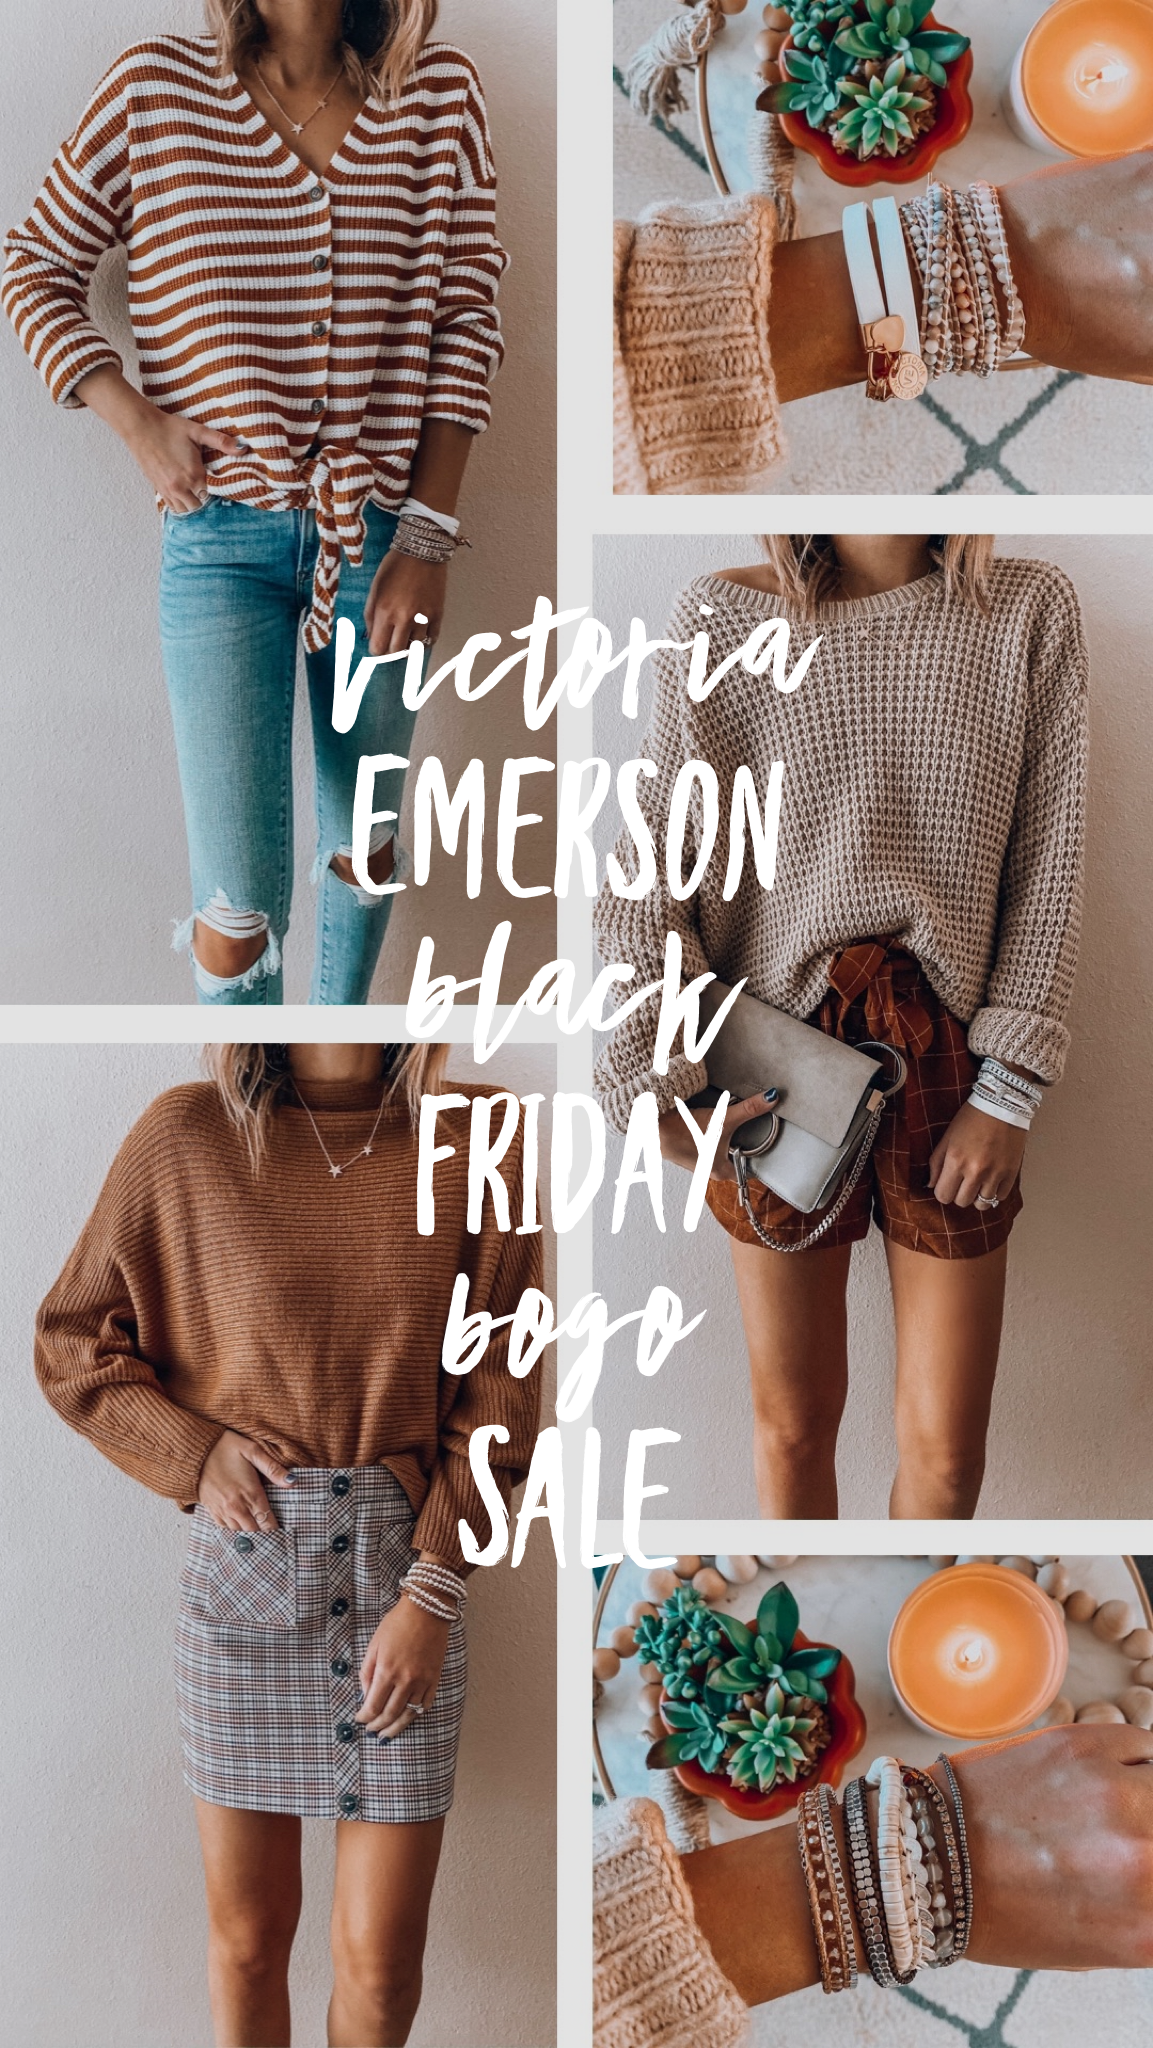 Victoria Emerson Black Friday BOGO Sale!